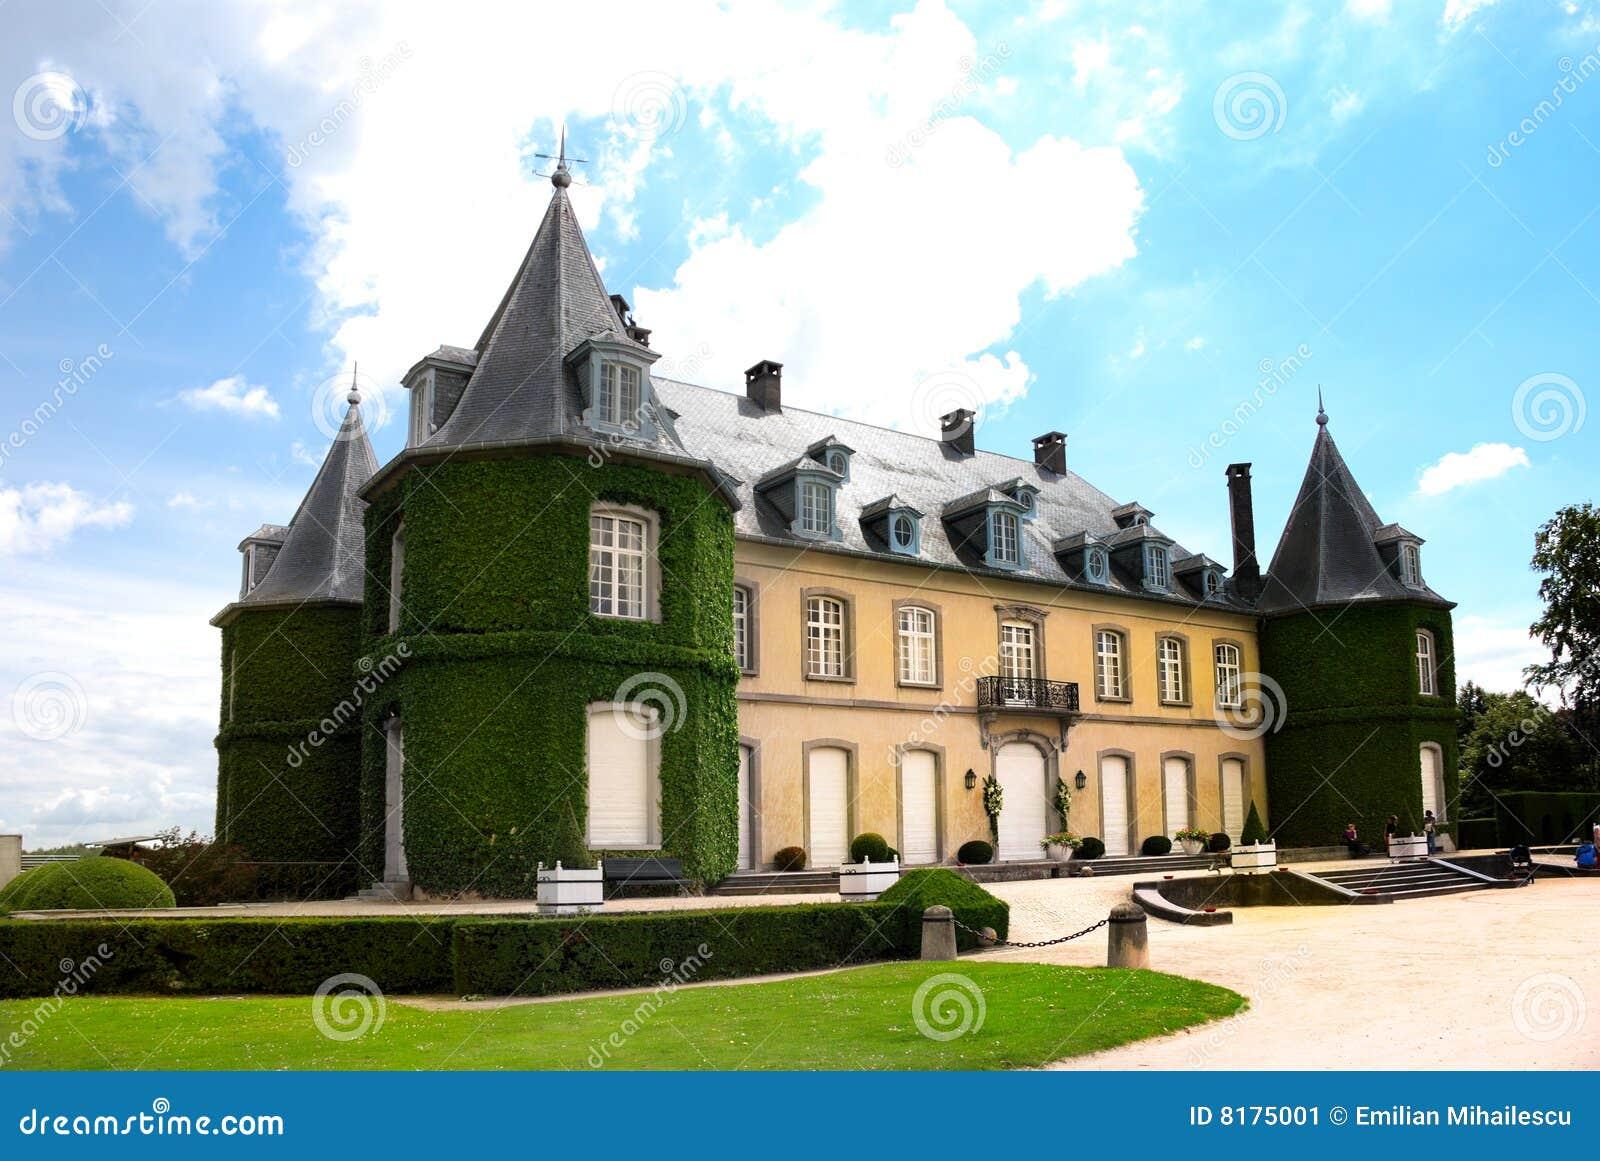 La Hulpe Belgium  city images : Chateau De La Hulpe South Of Bruxelles Belgium Stock Image Image ...